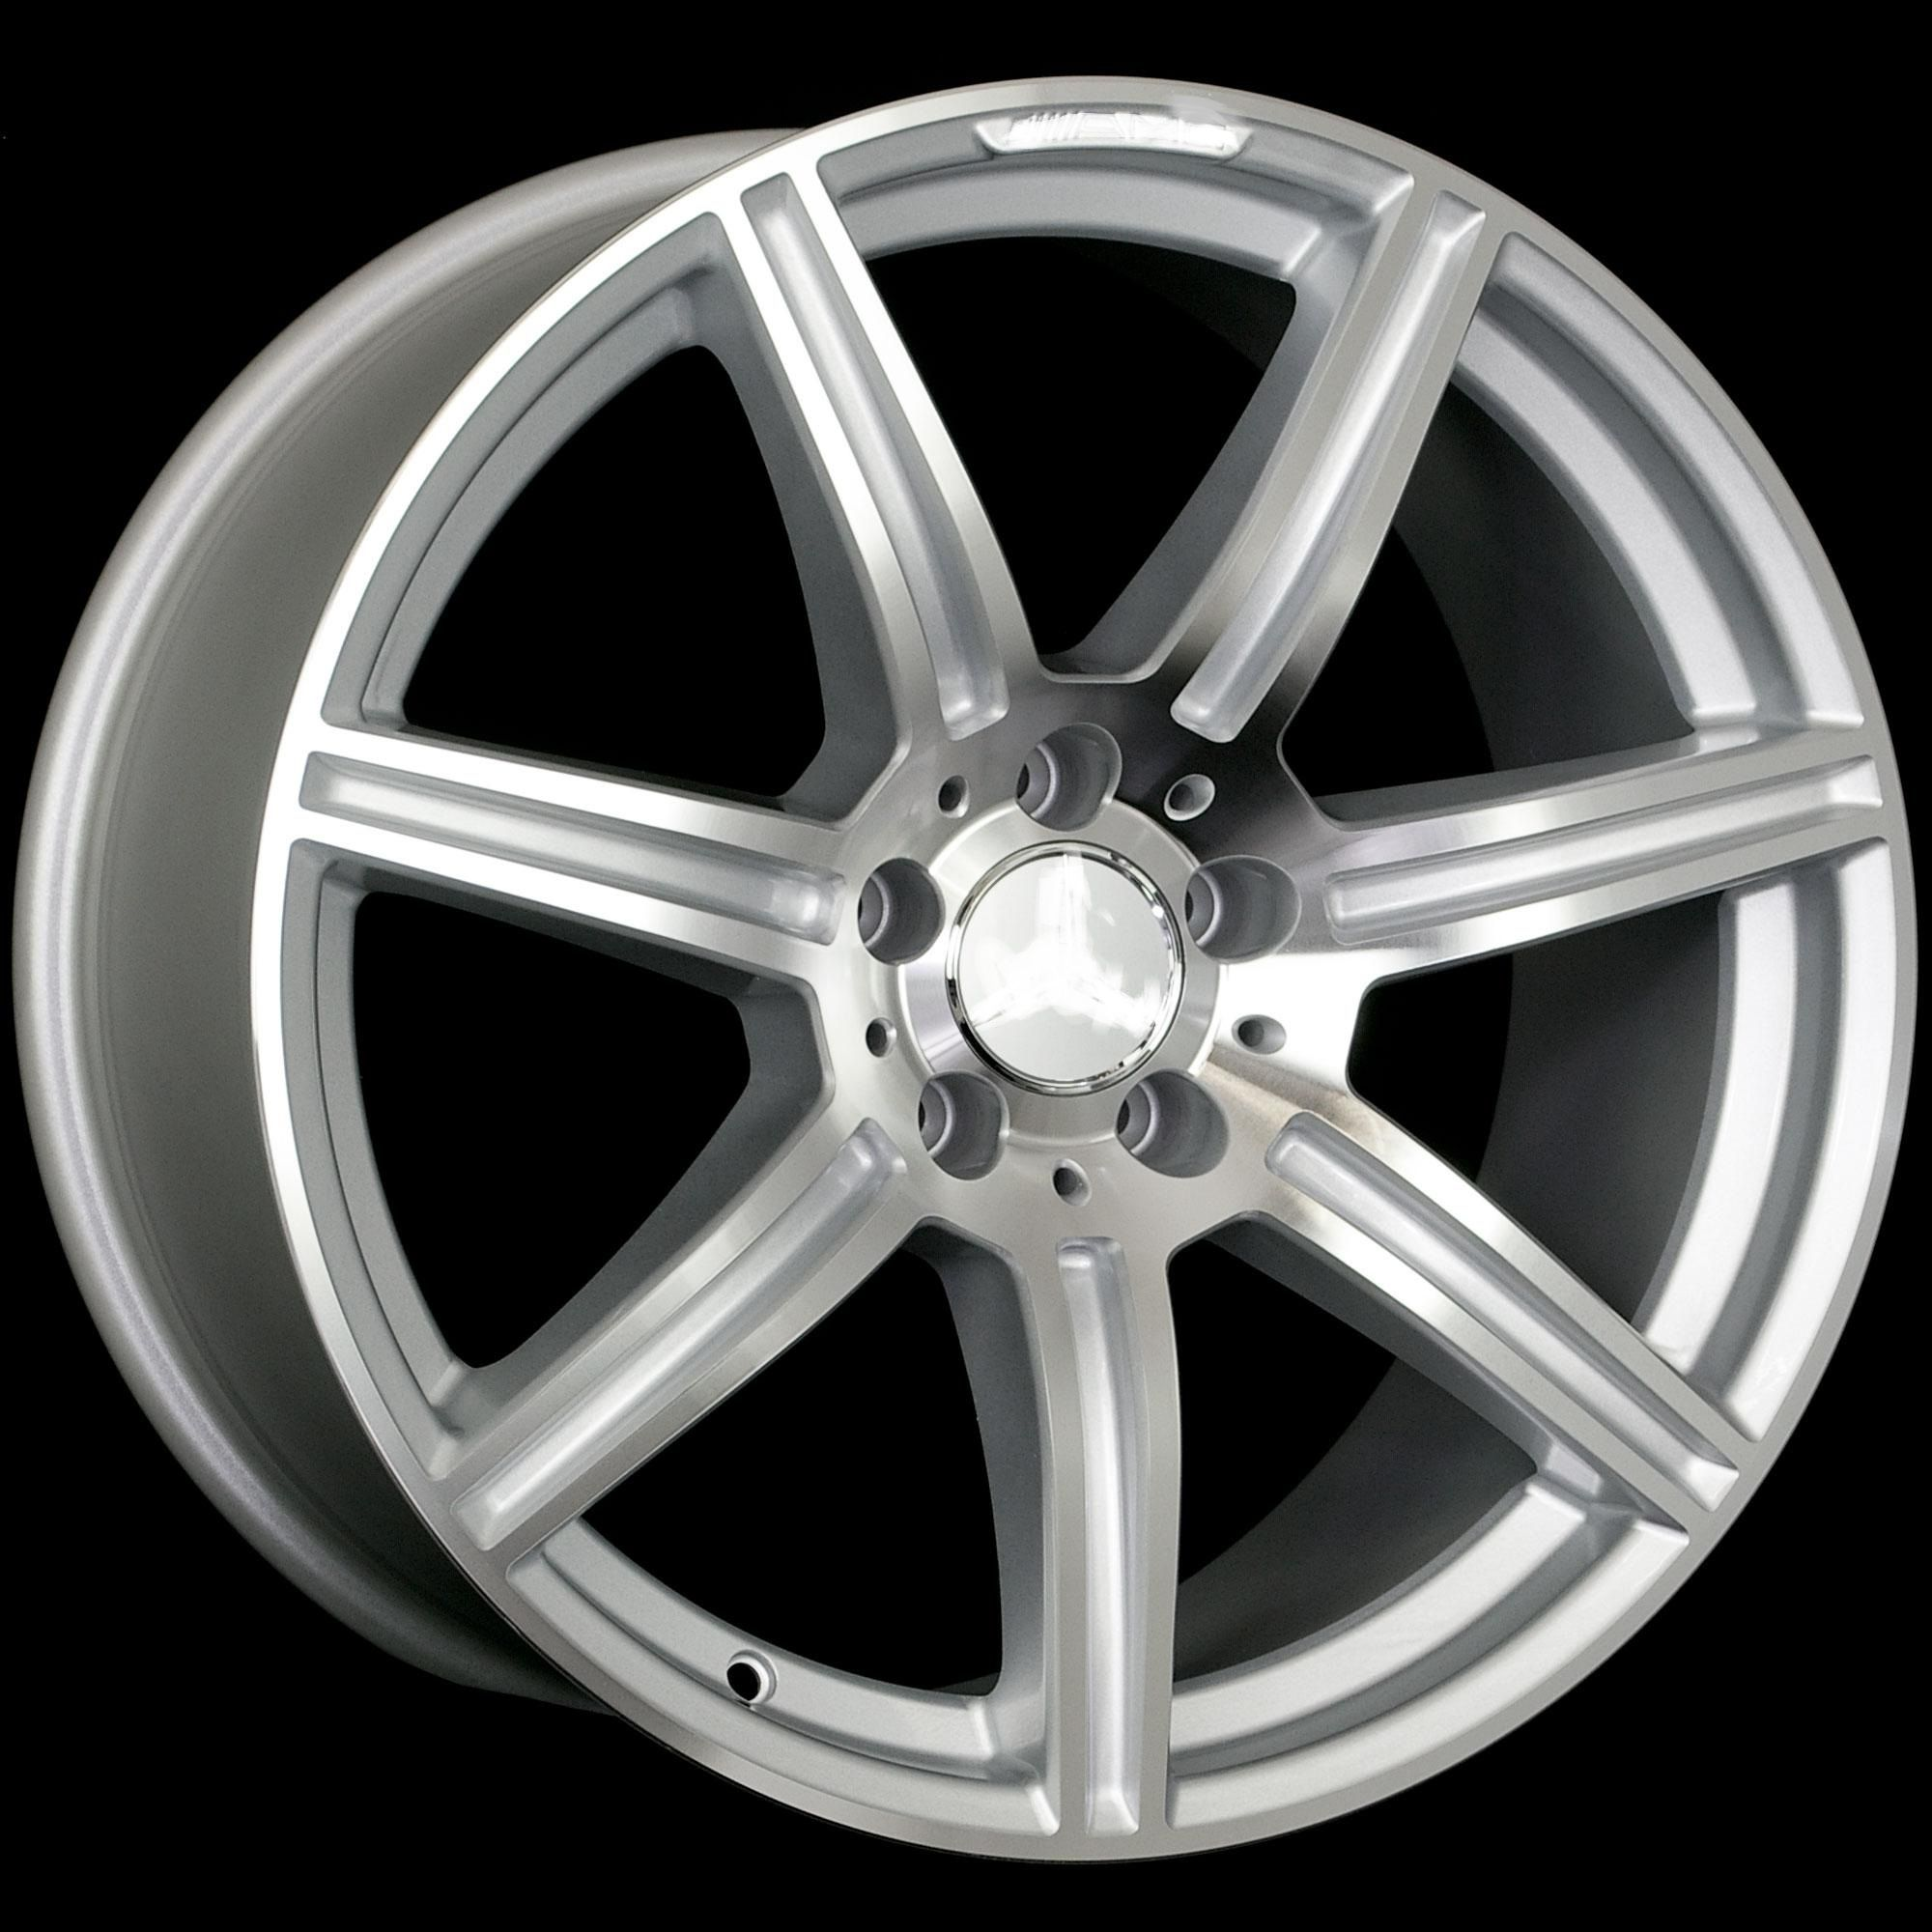 19 AMG E63 Style Wheels Rims Fit Mercedes s Class S320 S350 S500 S600